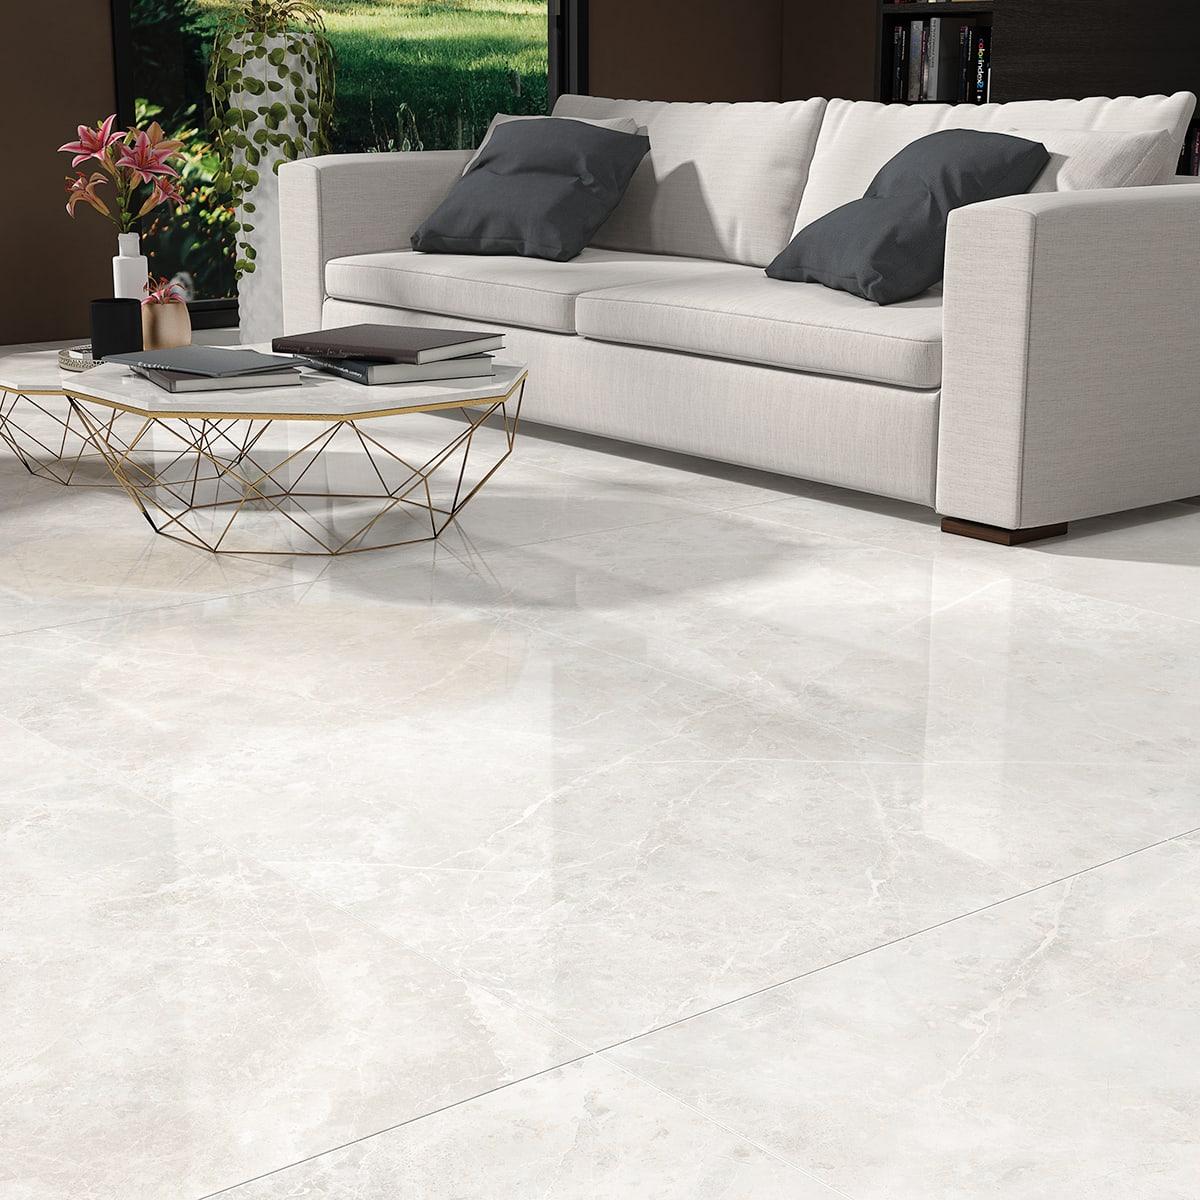 Pavimento Finto Marmo Lucido piastrella marmi 60 x 120 cm sp. 10.5 mm pei 4/5 grigio